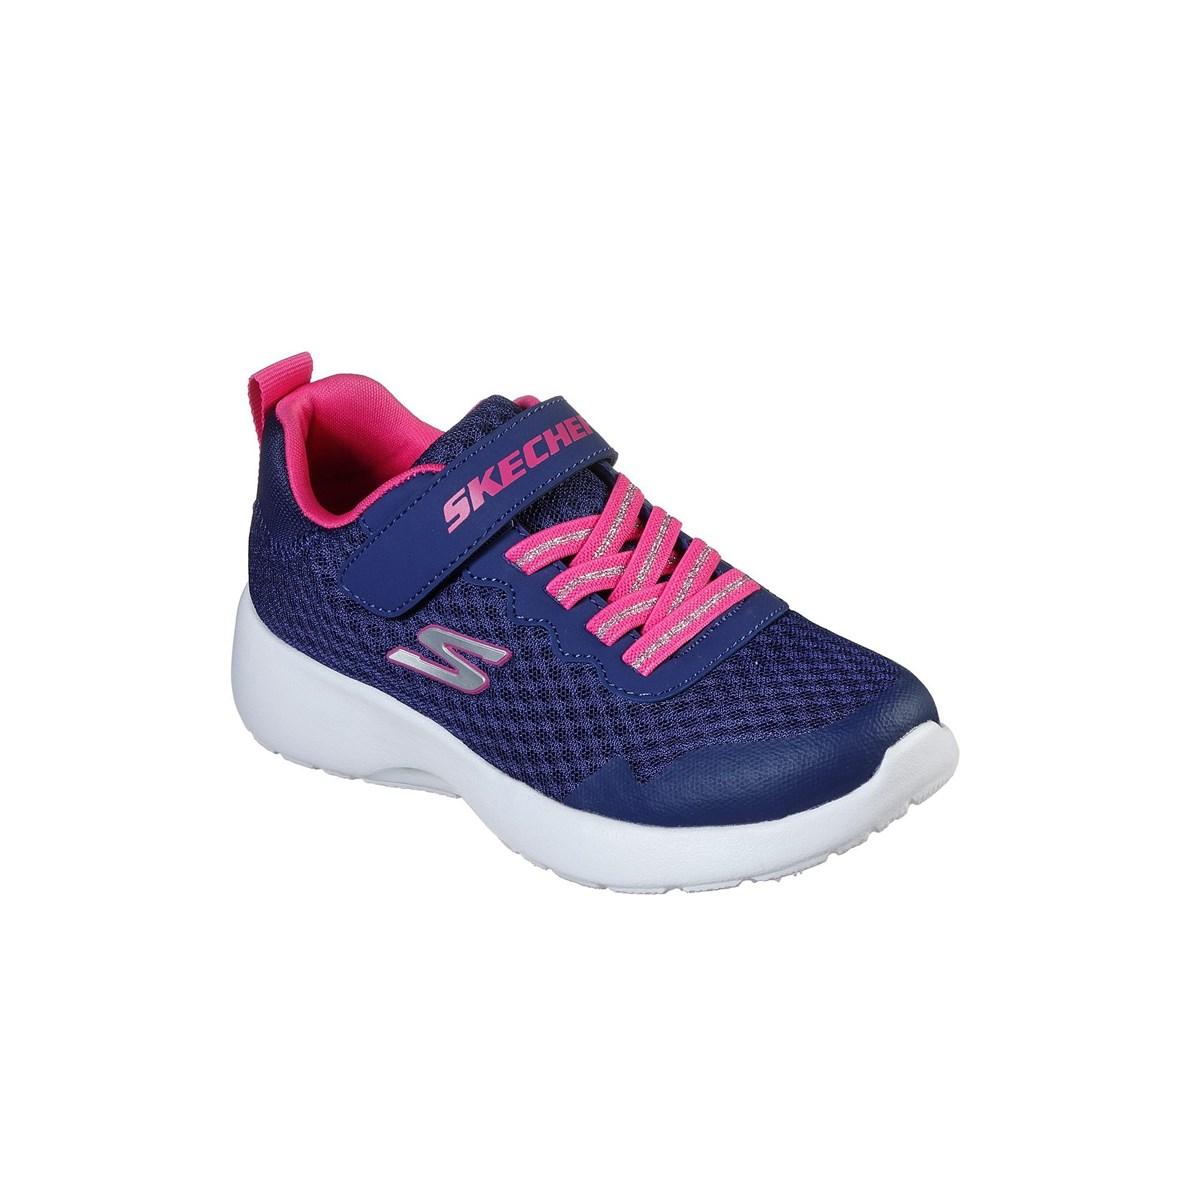 Dynamight-Lead Runner Çocuk Mavi Spor Ayakkabı (81303L NVY)